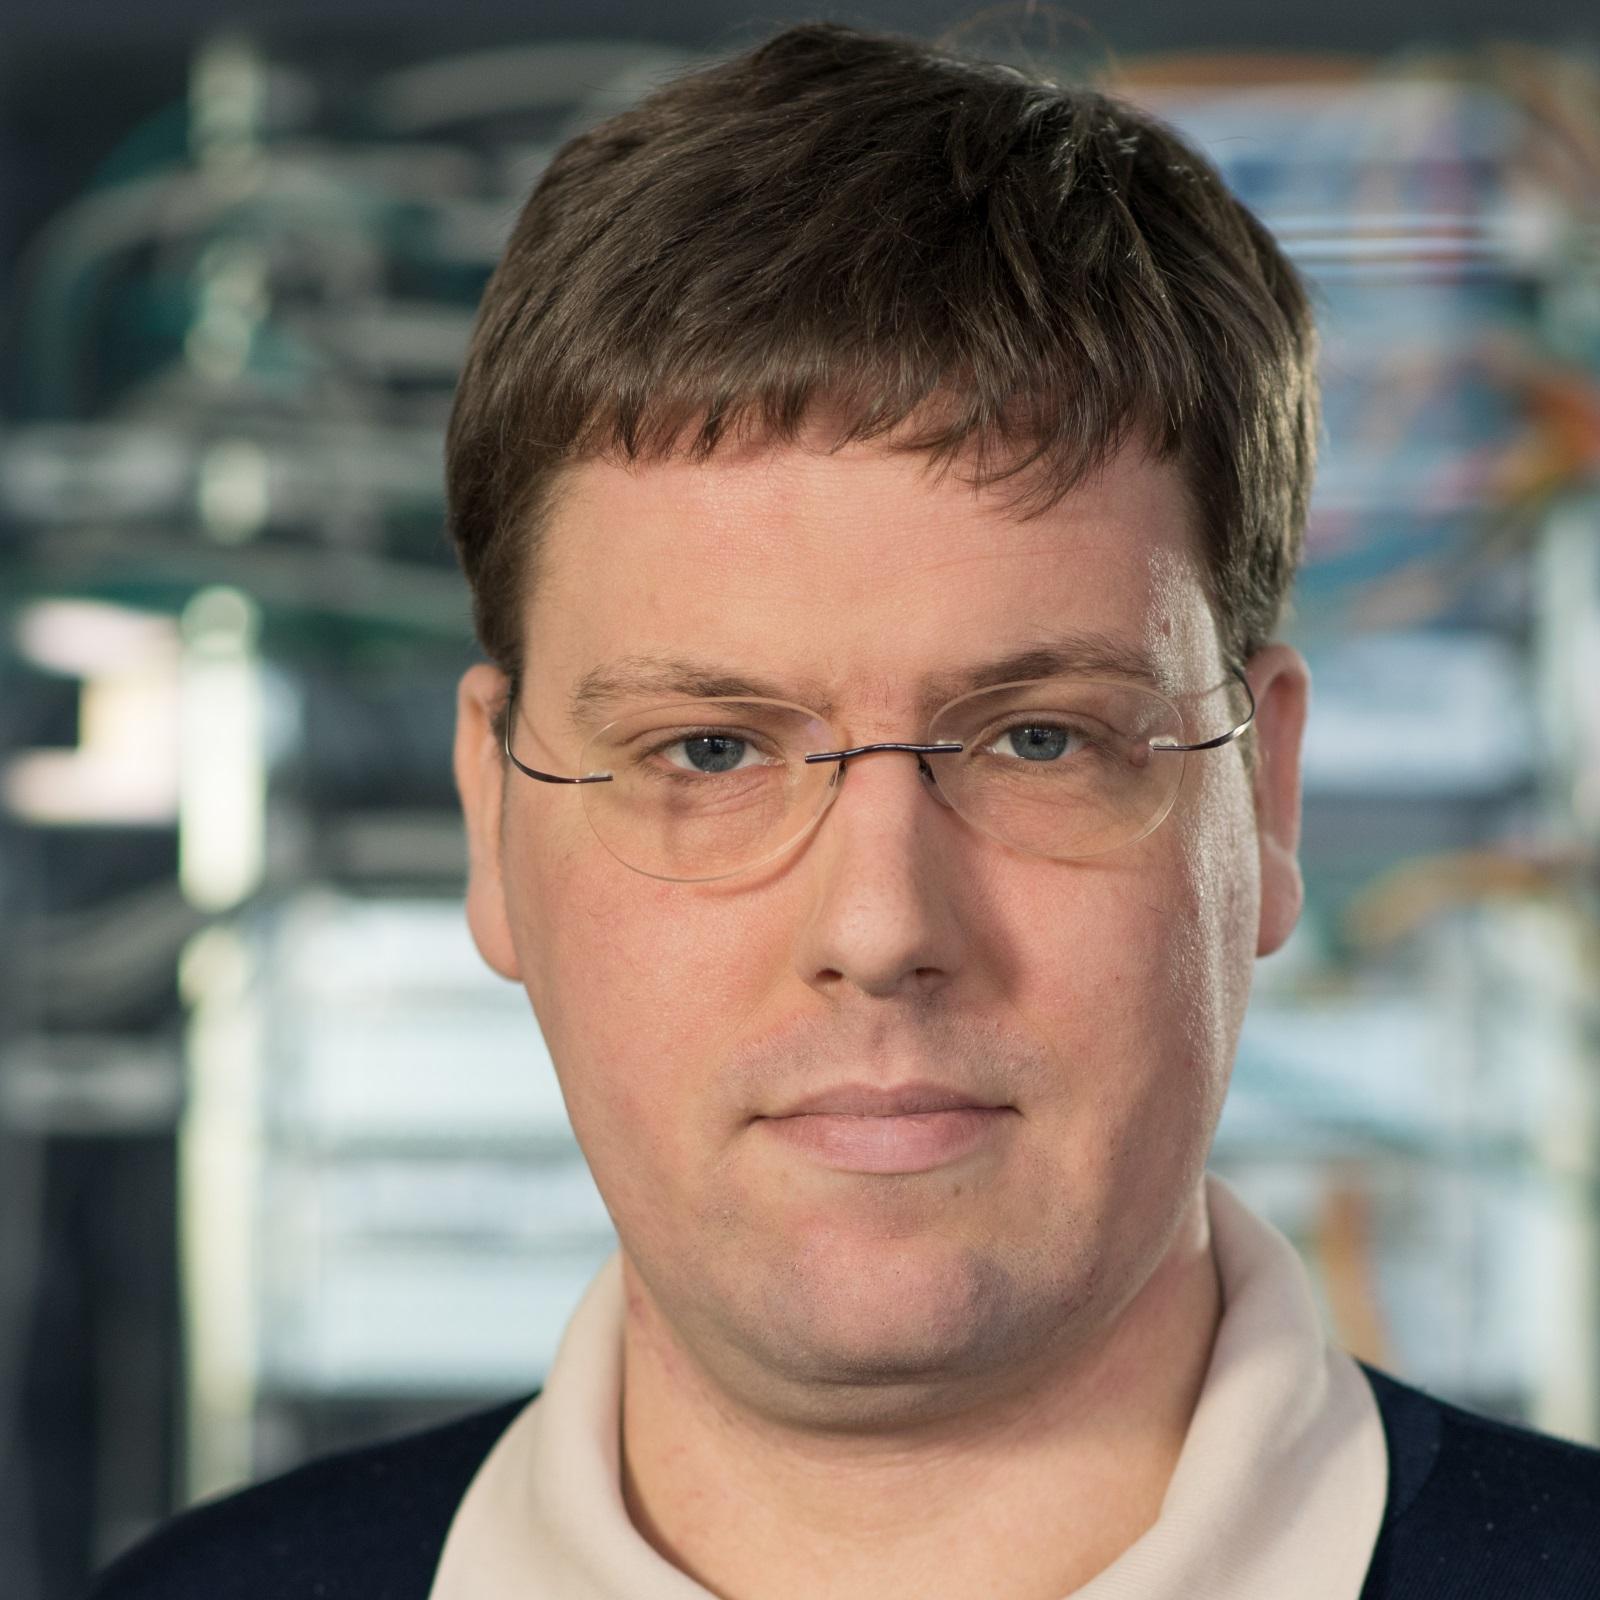 Prof. Dr. rer. nat. Andreas Hanemann